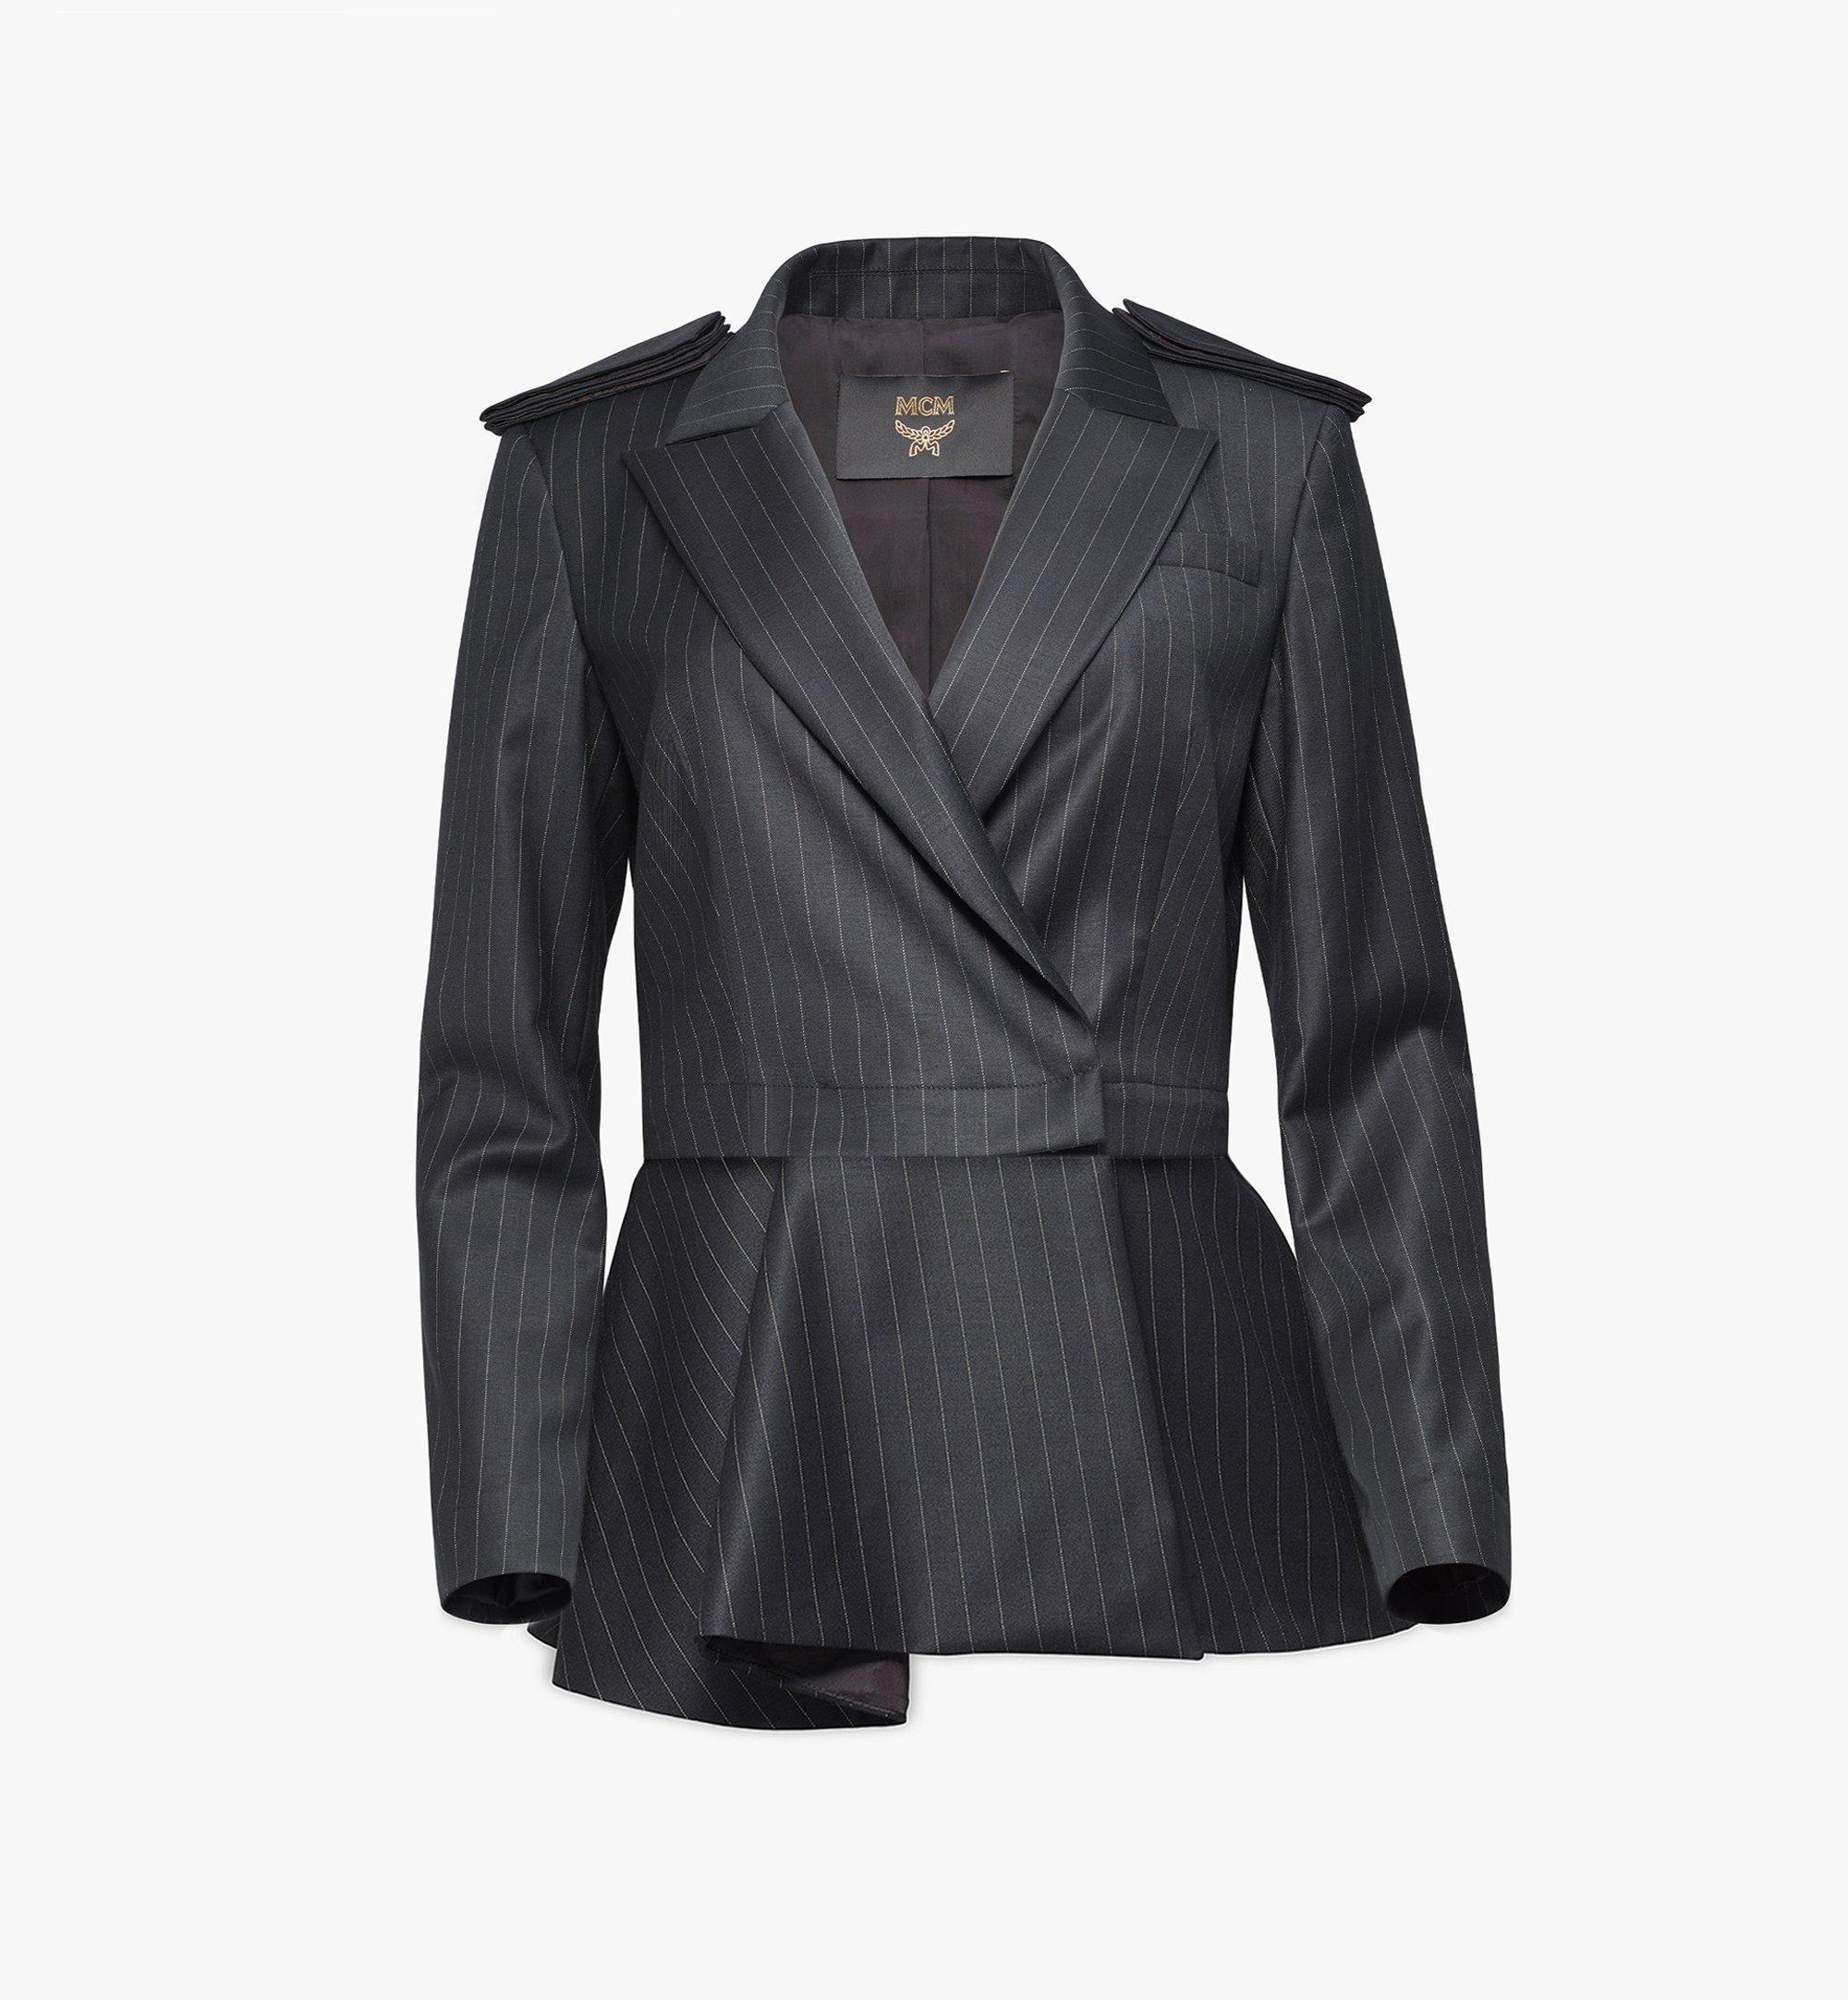 MCM 女士肩章羊毛西裝外套 Black MFJBSMM02B2040 更多視圖 1